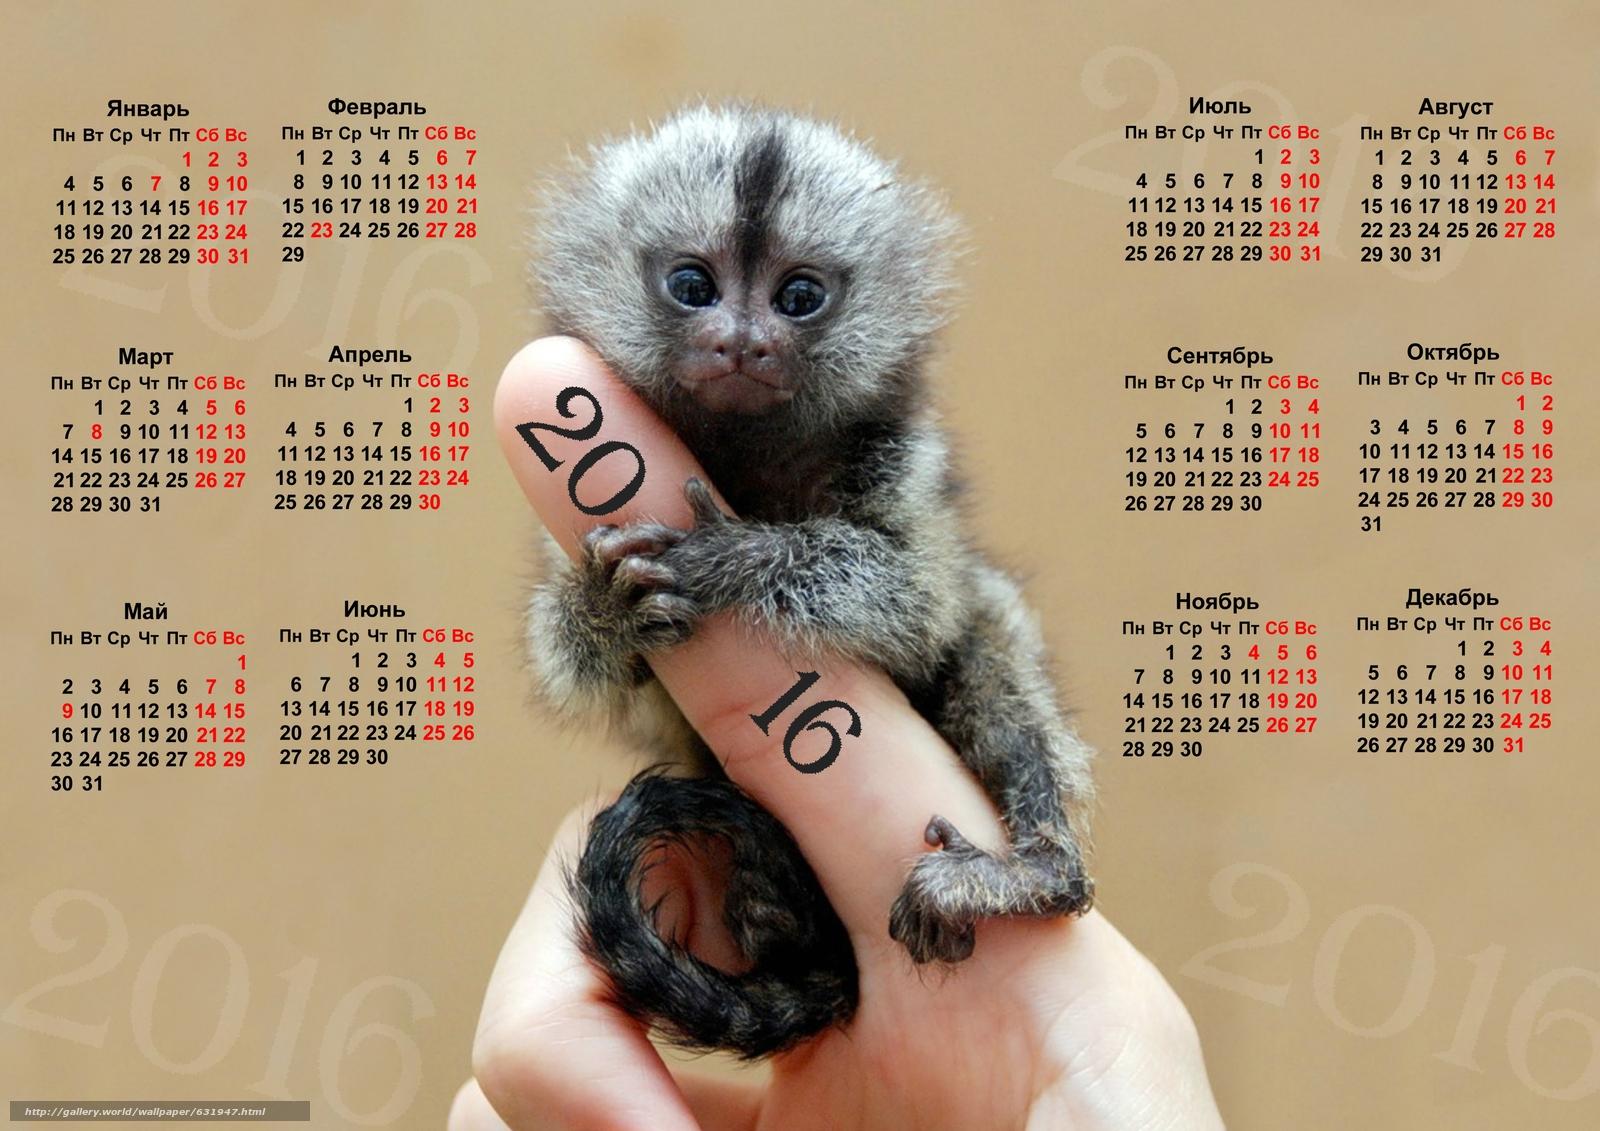 Descargar gratis Calendario dedo mono,  mono,  Símbolo del mono 2016,  Calendario 2016 Fondos de escritorio en la resolucin 3508x2480 — imagen №631947